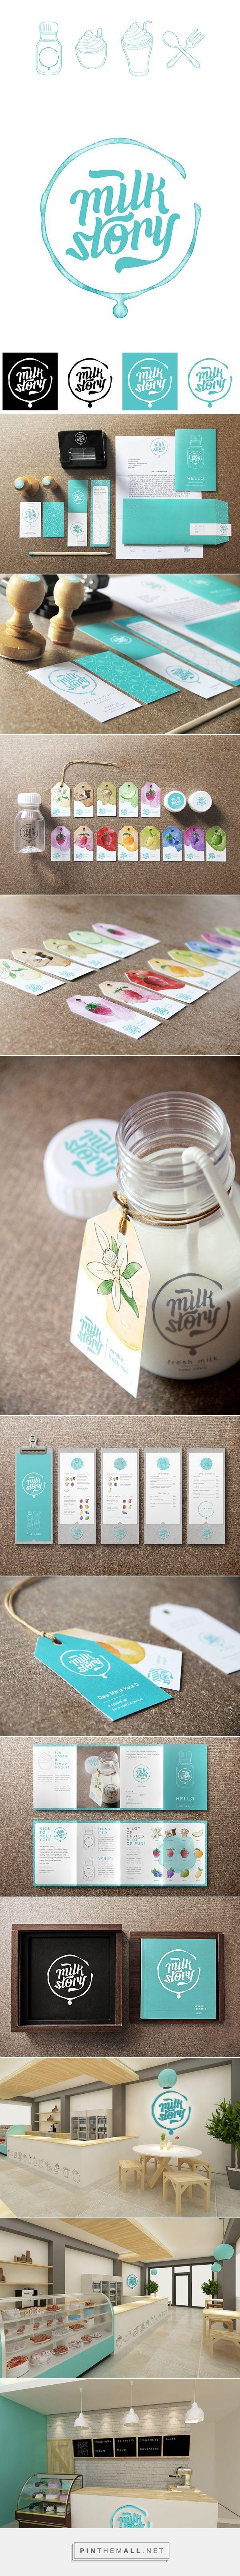 Milk Story Brand Identity on Behance - created via http://pinthemall.net